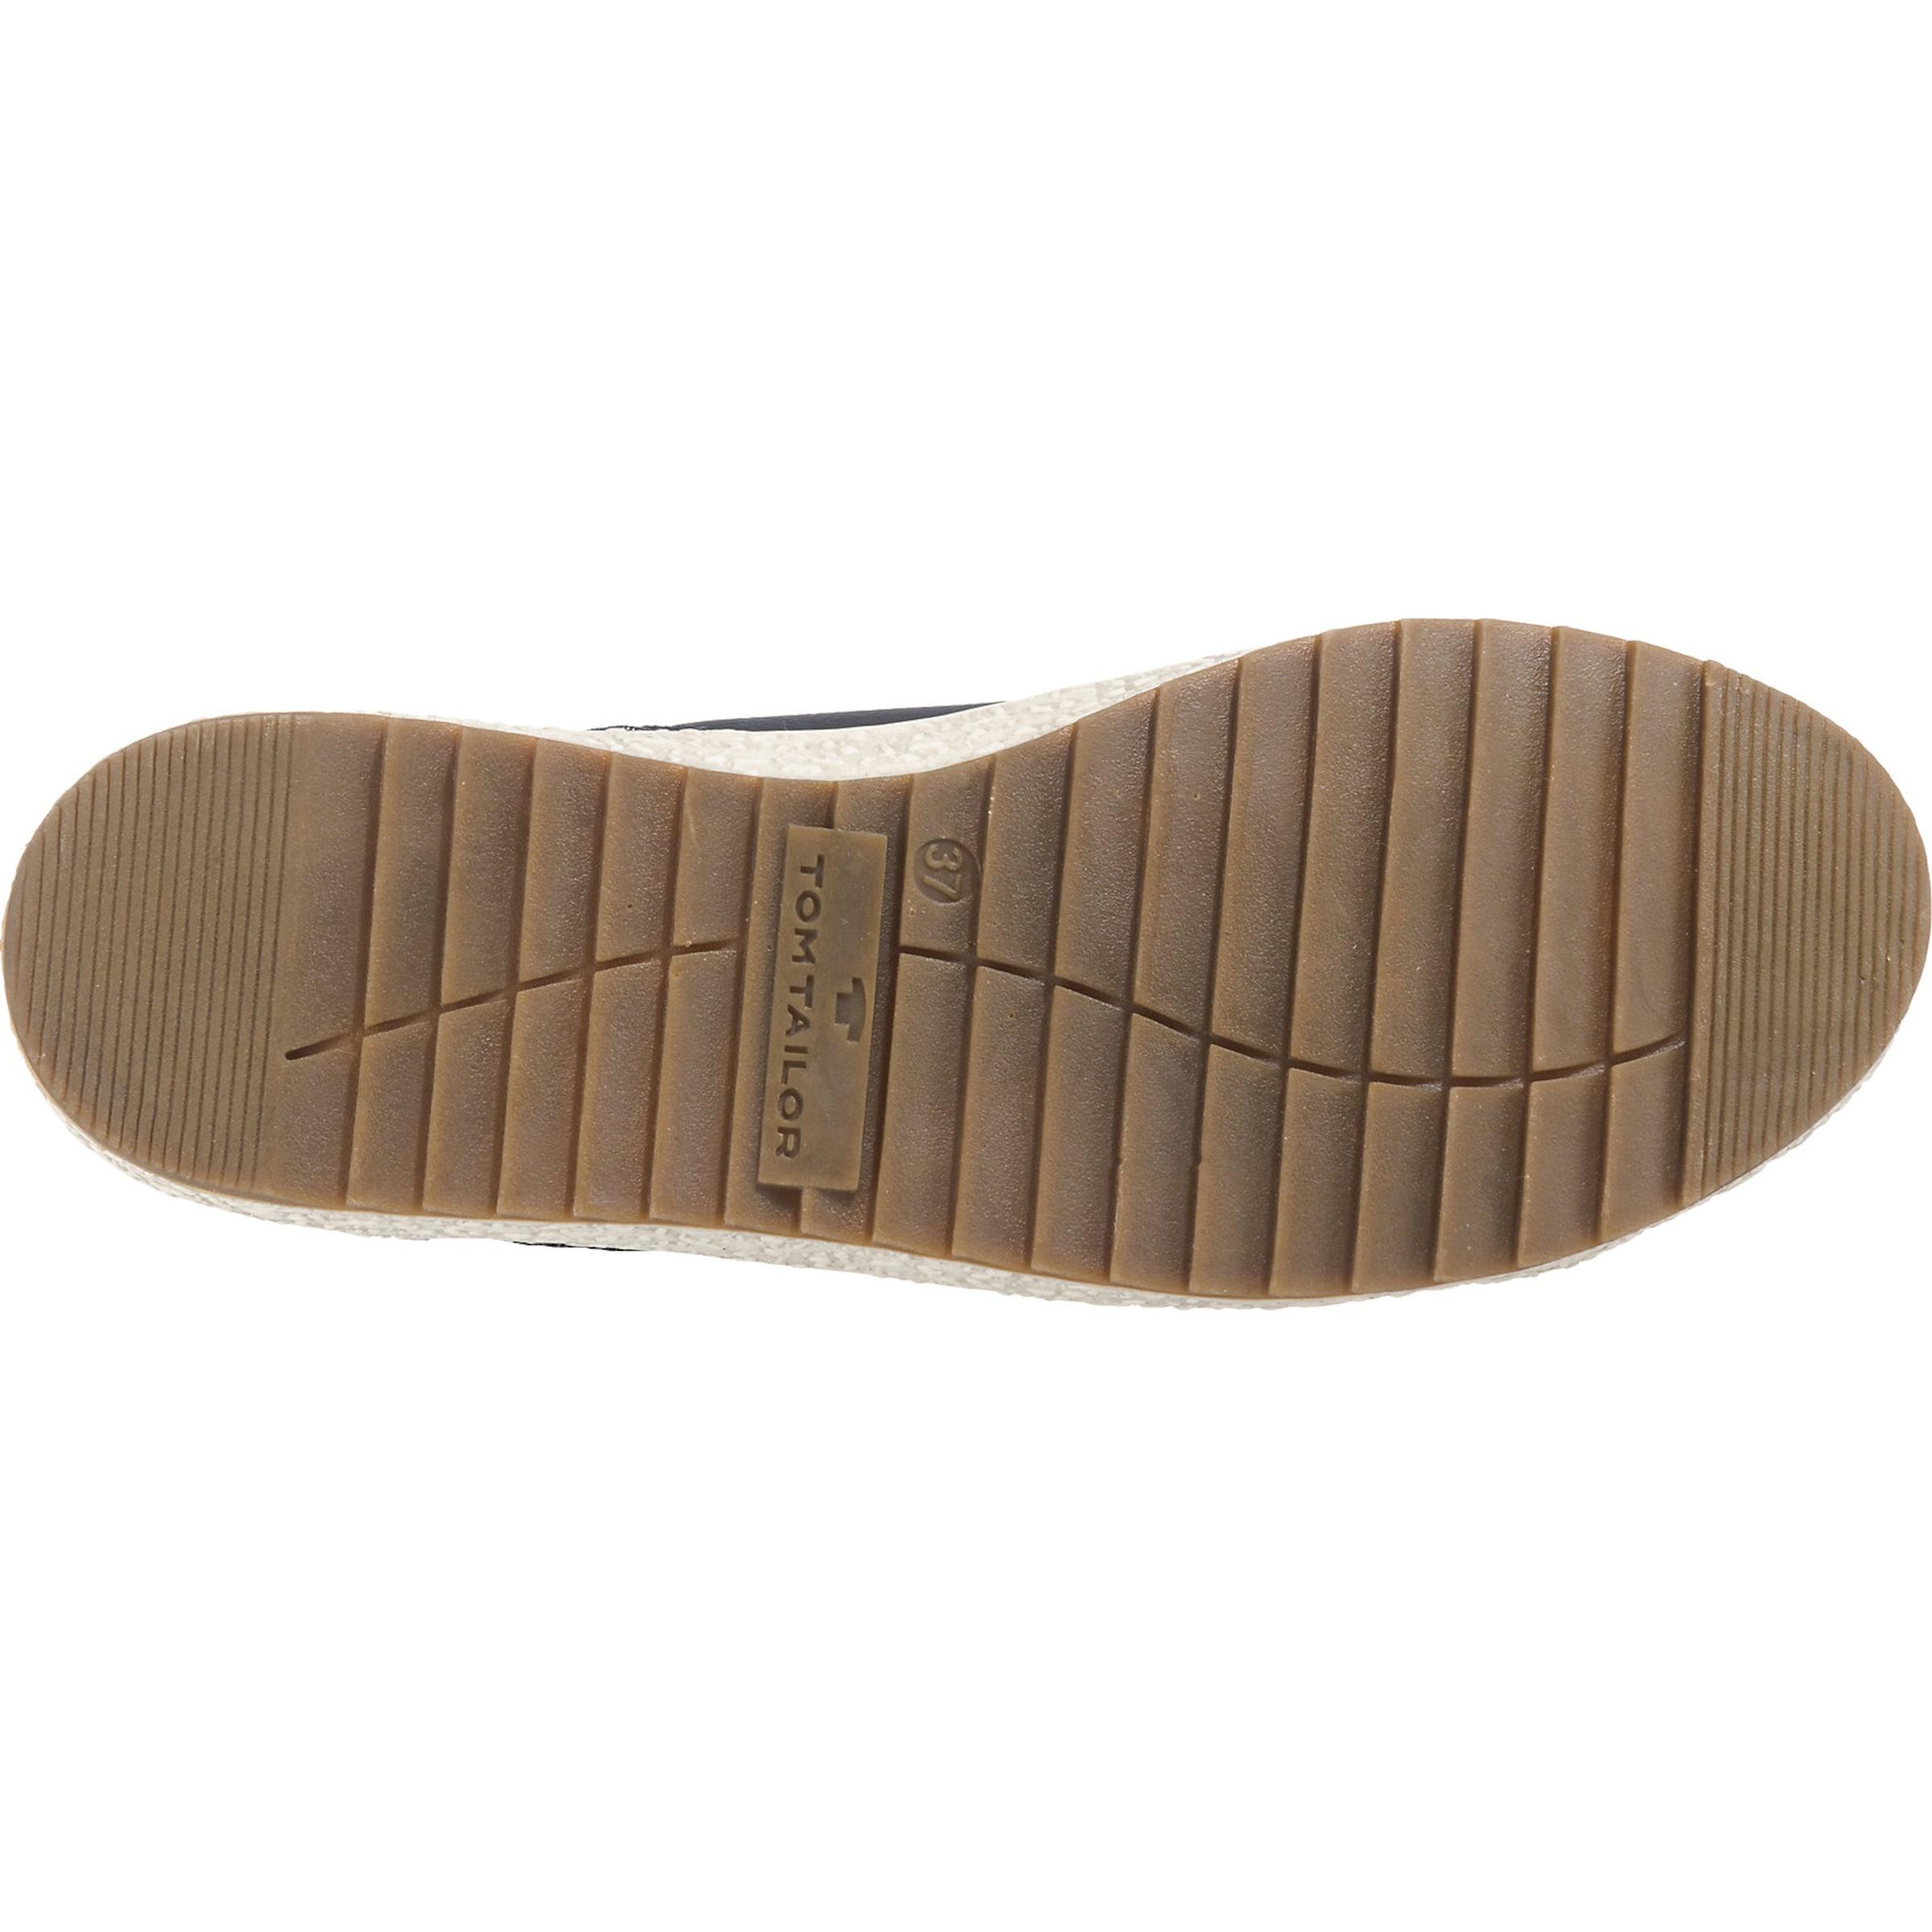 Tailor Sneakers High Tom In Navy LqcjS54RA3